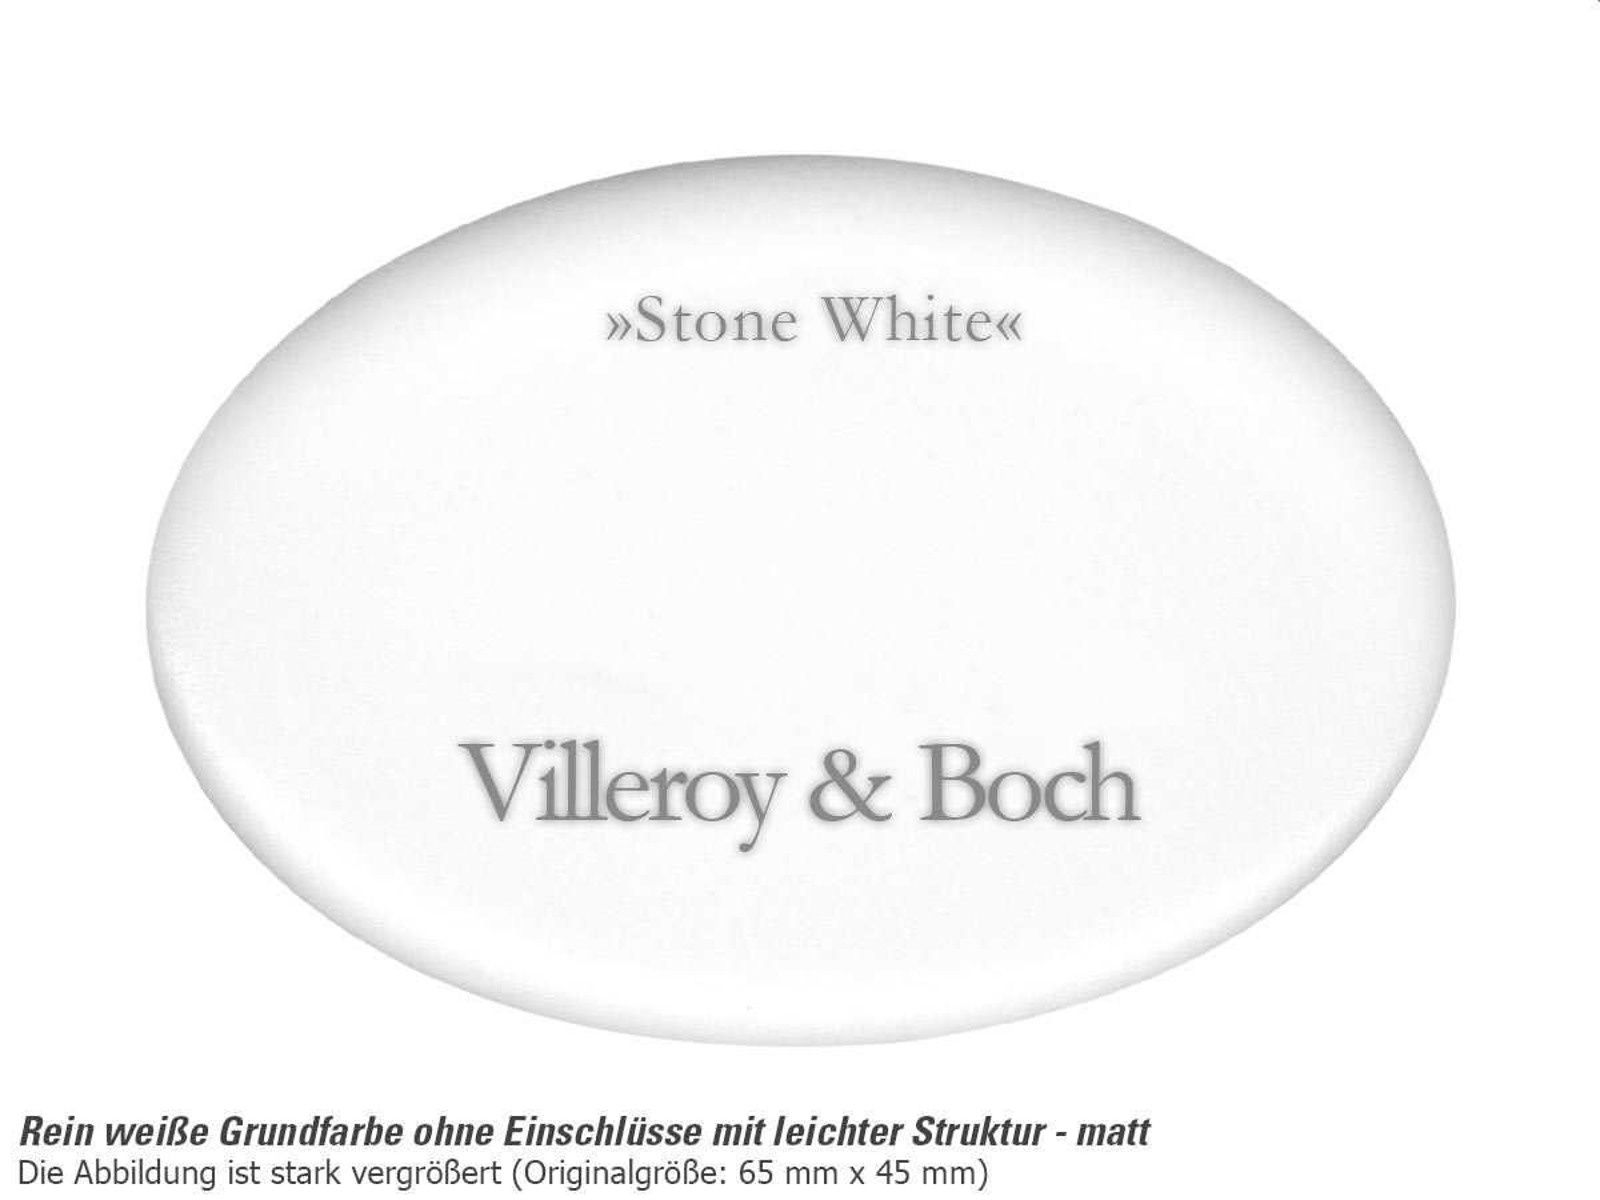 Villeroy & Boch Subway 60 XU Stone White - 6758 02 RW Keramikspüle Exzenterbetätigung